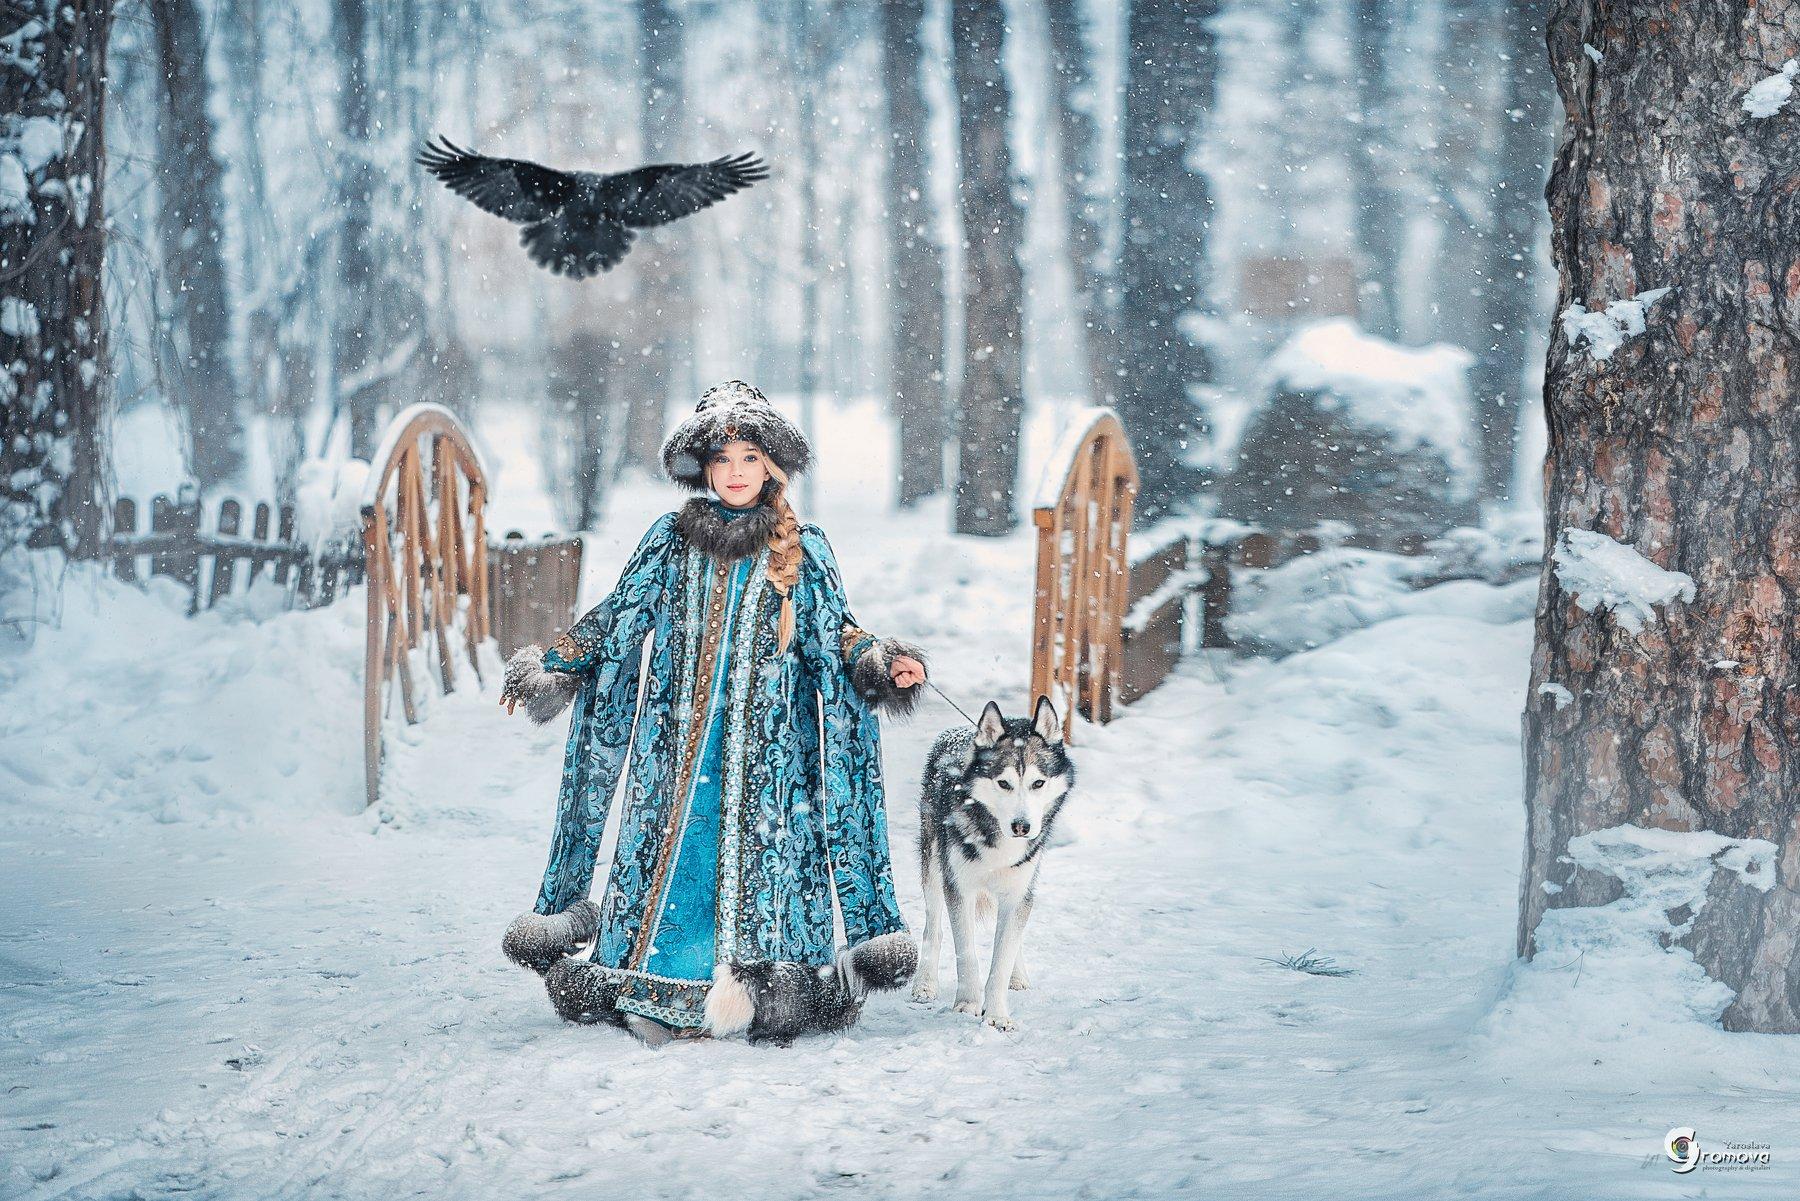 зима, ворон, собака, хаски, княжна, принцесса, снег, сказка, девочка,, Ярослава Громова